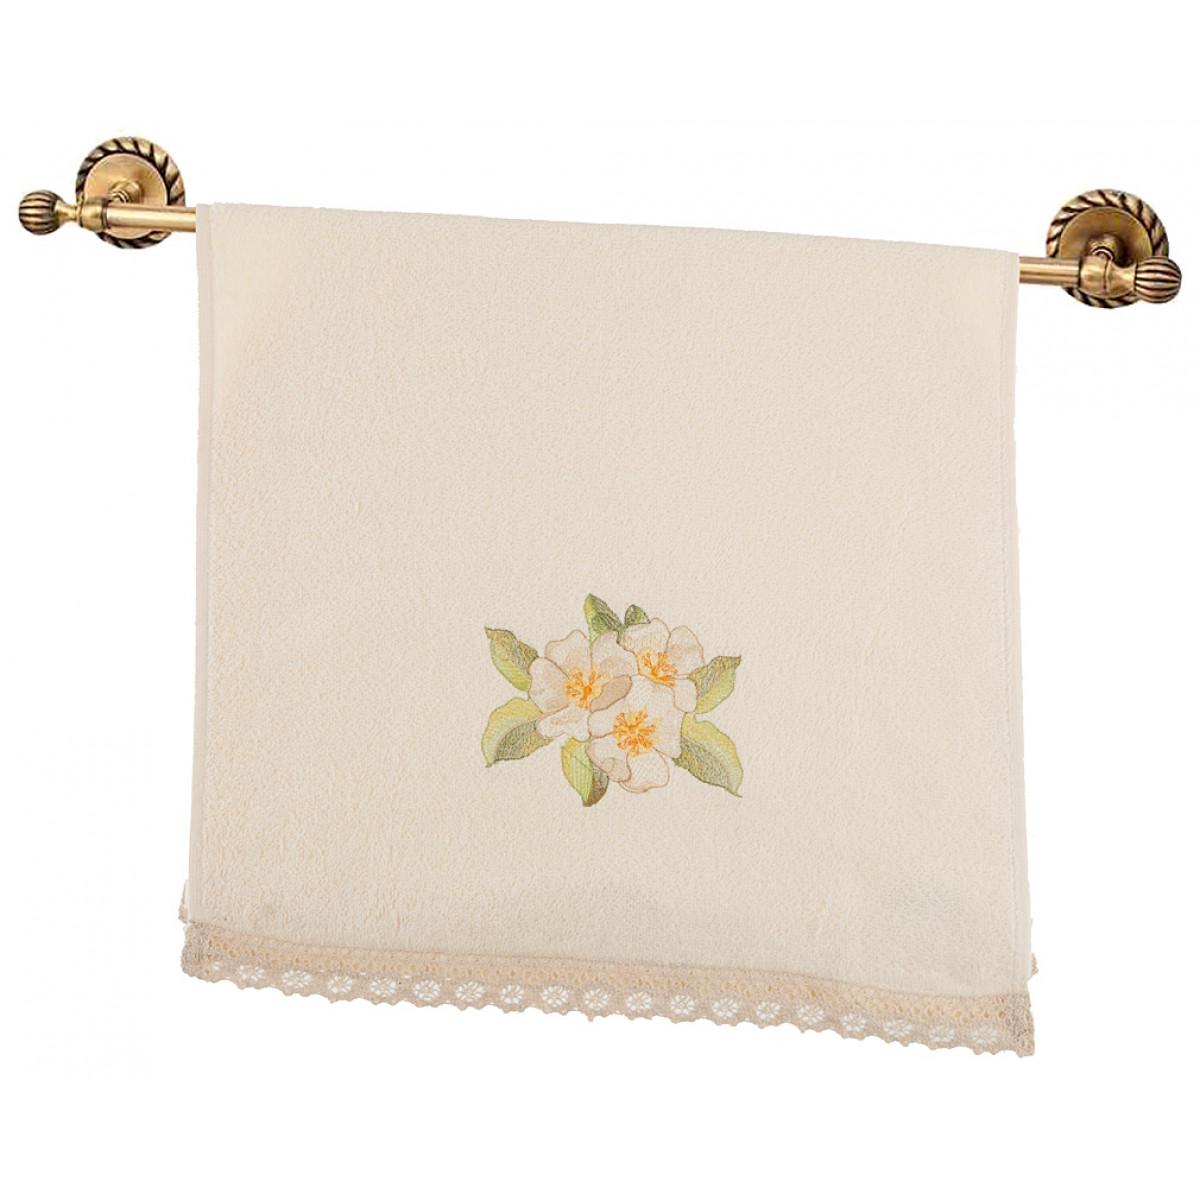 Полотенца Santalino Полотенце Farah  (40х70 см) полотенца santalino полотенце shulamite 40х70 см